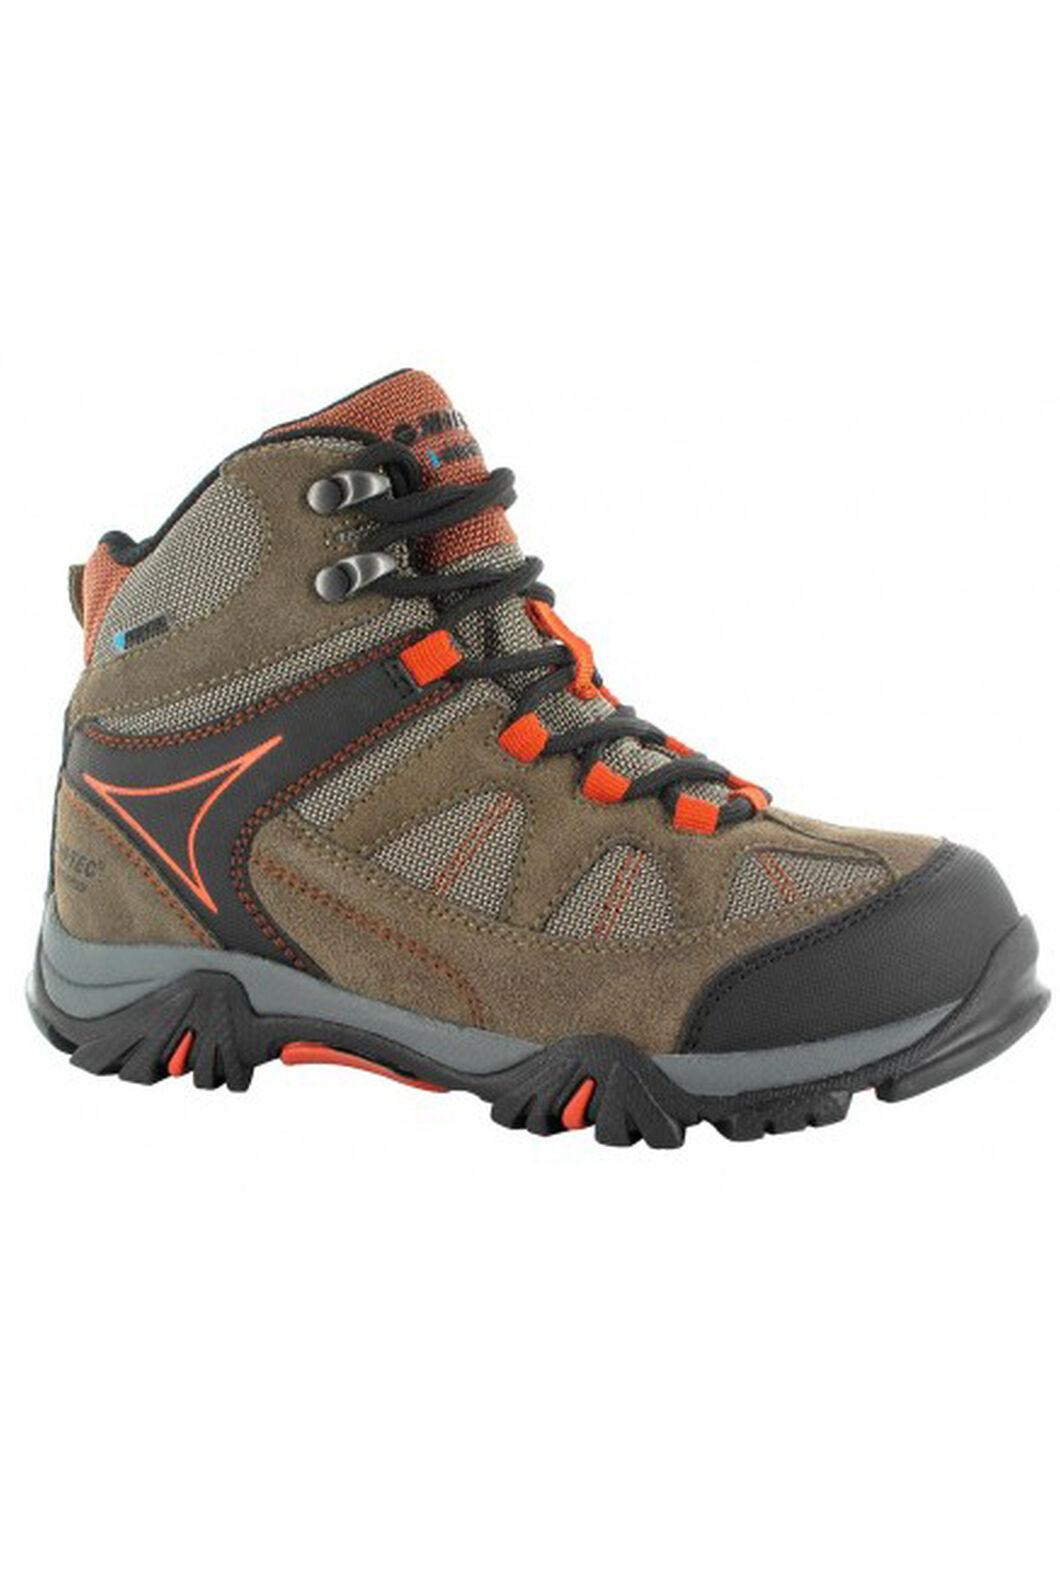 Hi-Tec Altitude Lite I WP Boots - JR, Smokey Brown/Taupe/Red Rock, hi-res